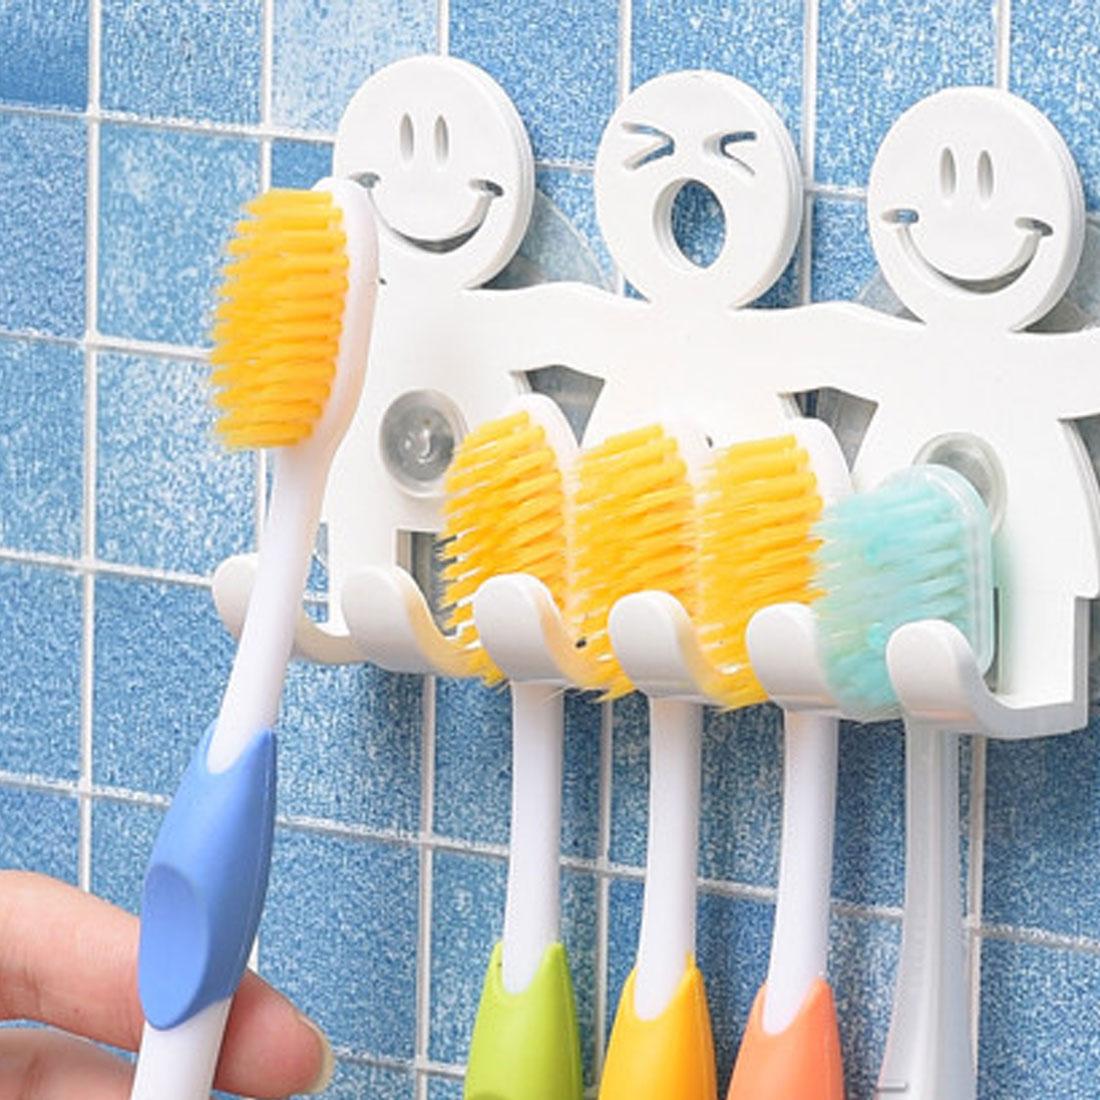 5 Position Tooth Brush Holder Suction Hooks Bathroom Sets Cute Smile Cartoon Sucker Toothbrush Holder